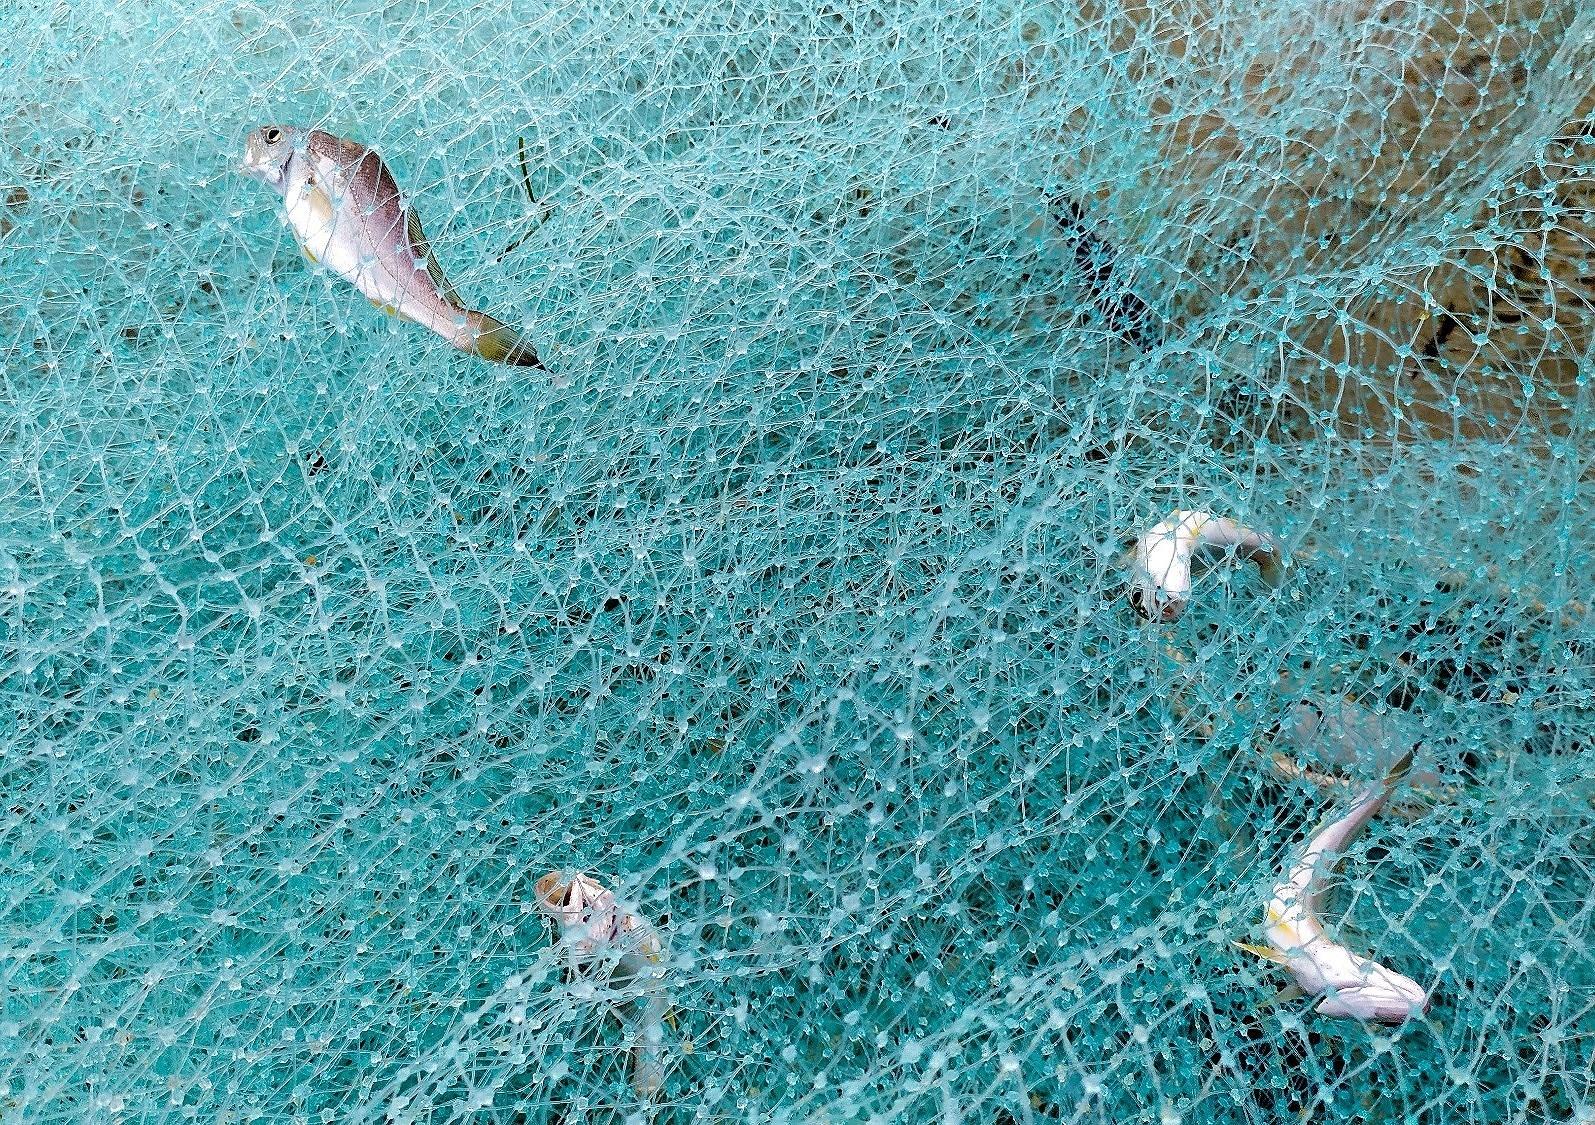 Fishermen pull in nets in Da Nang city hinh anh 5